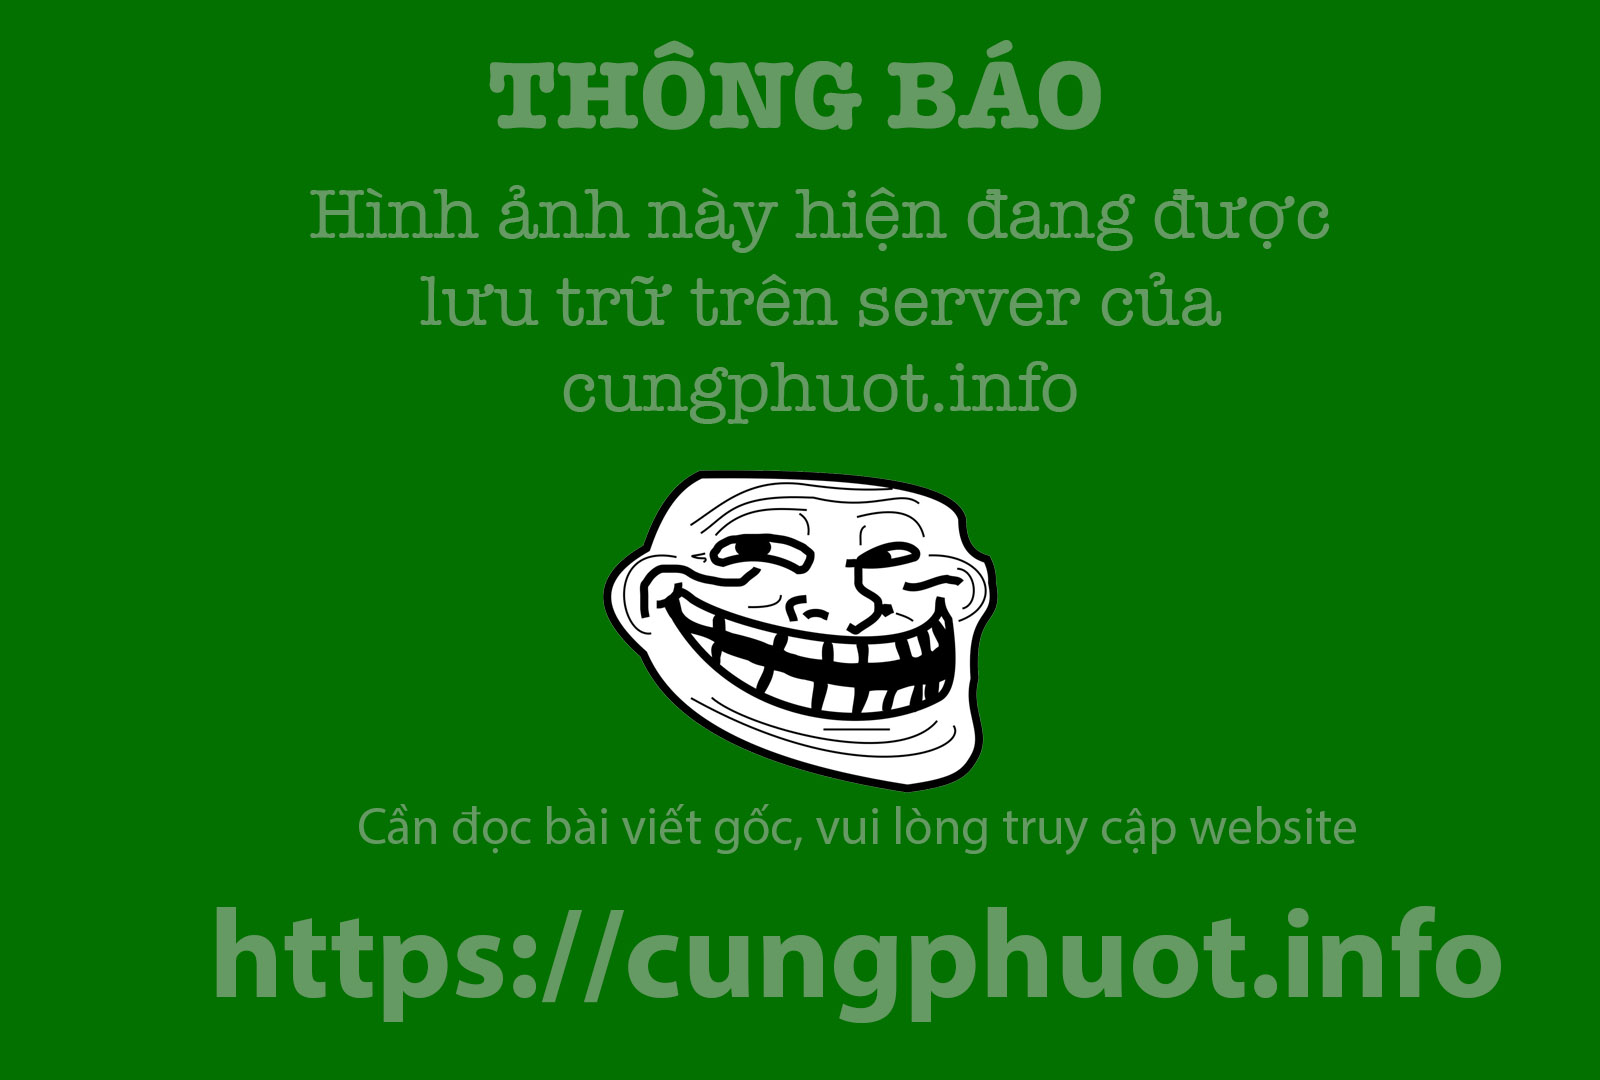 Dan phuot me man ve dep ky vi cua hang Prai o Quang Tri hinh anh 16